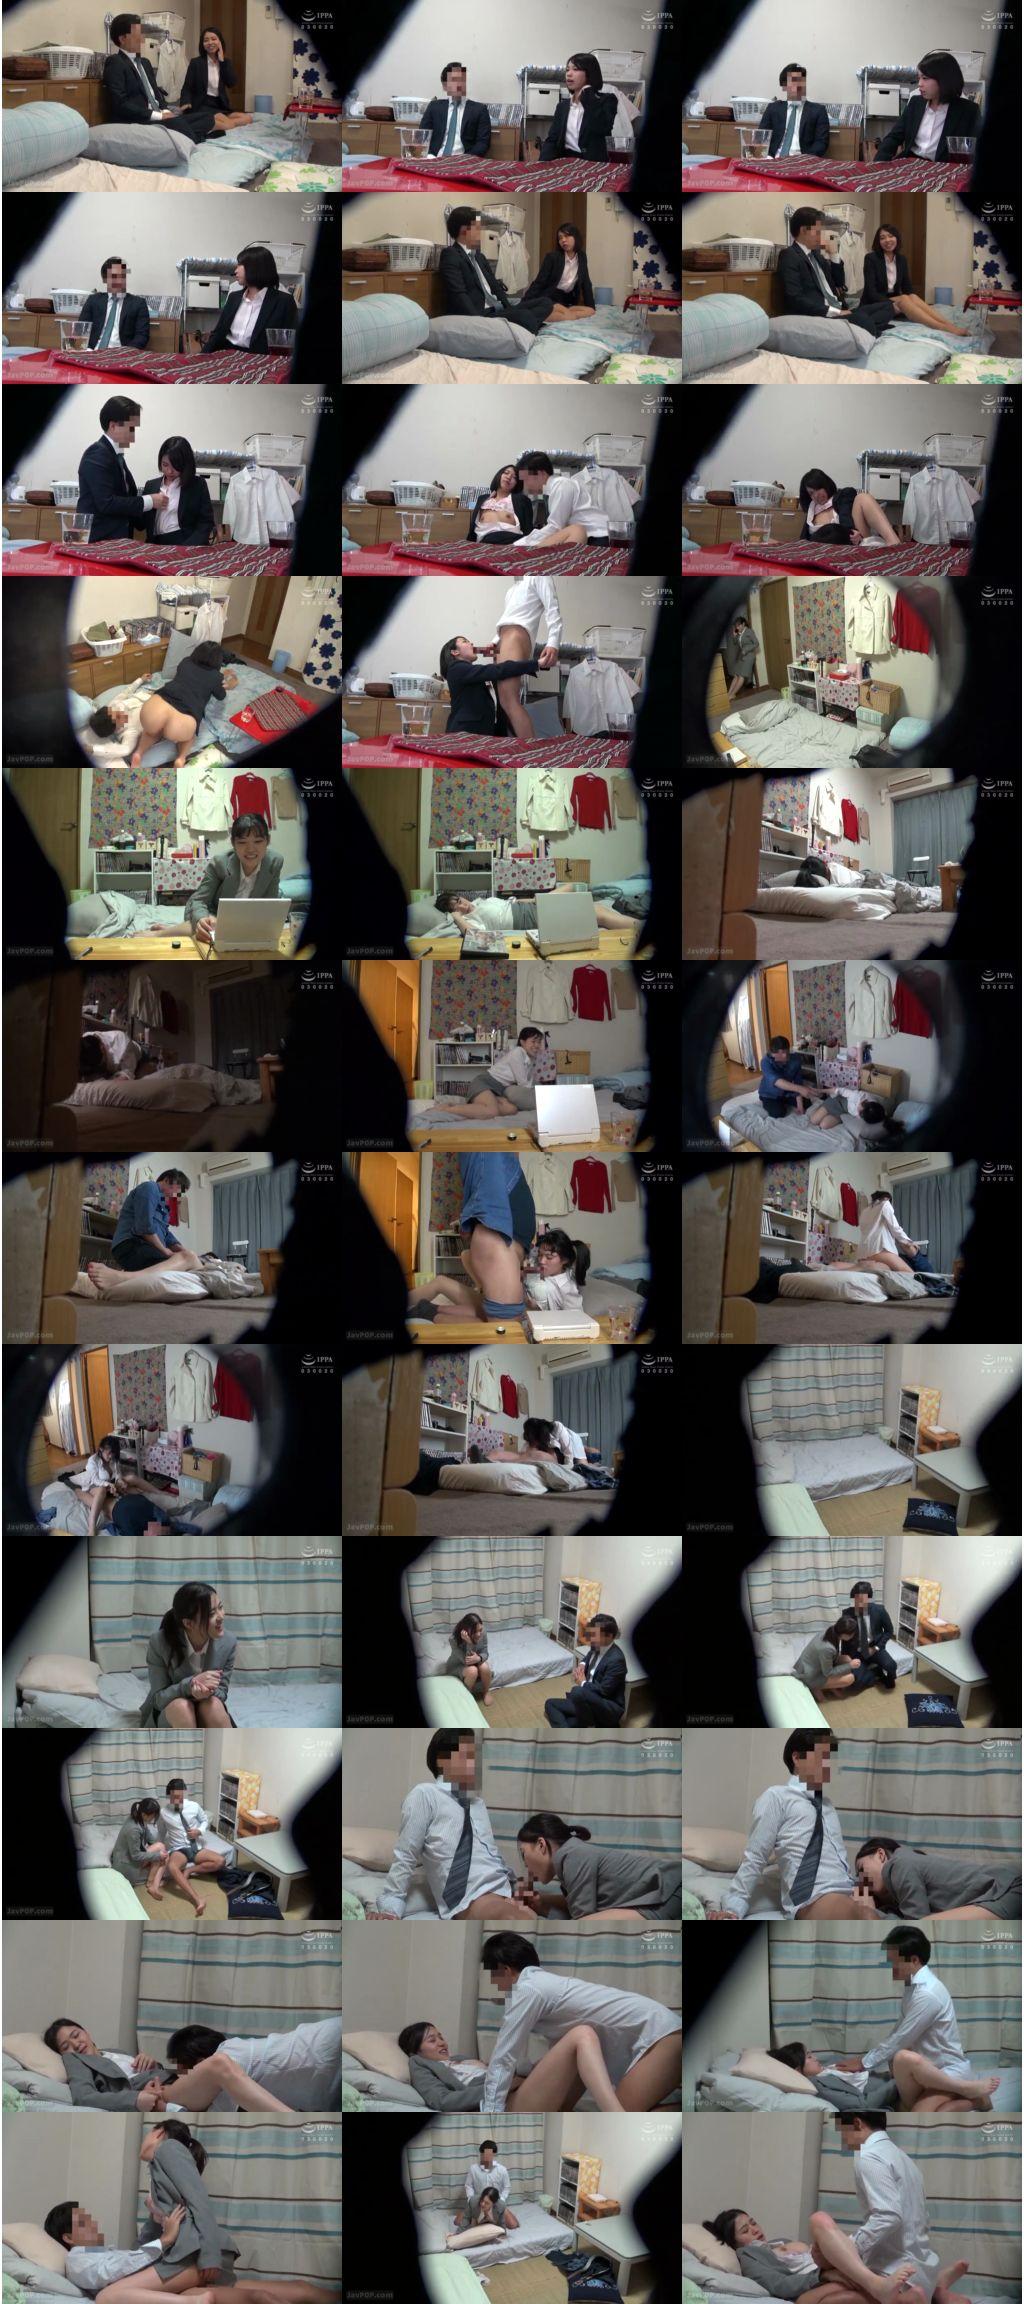 c 2574 s - [C-2574] AVメーカーの社員寮にカメラを仕掛けたらこんな映像撮れた!! 01 ゴーゴーズ Voyeur 盗撮 Go-go-zu Subordinates / Colleagues